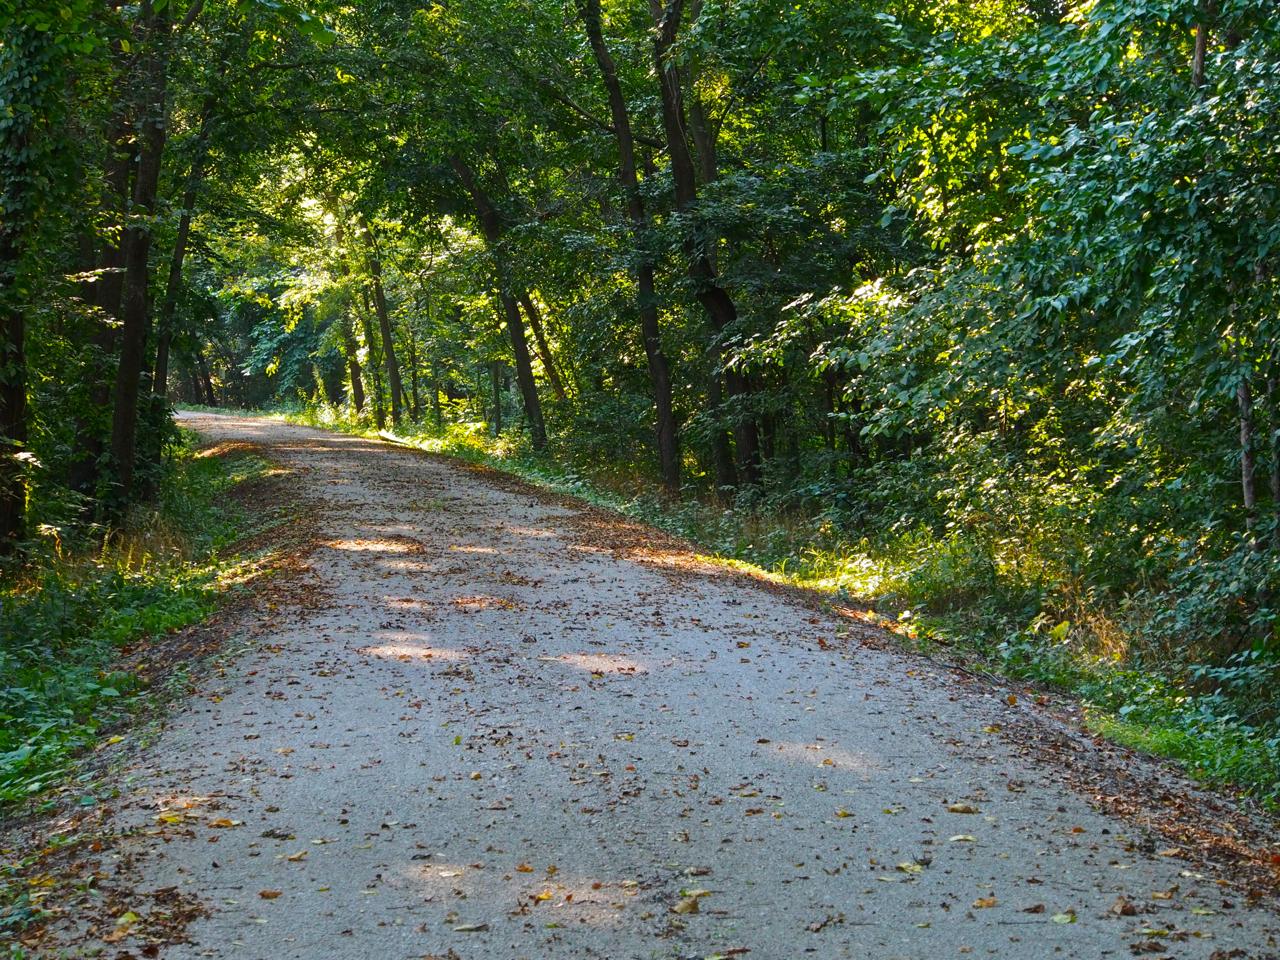 Missouri & The Katy Trail | Paul and Eyna Katy Trail